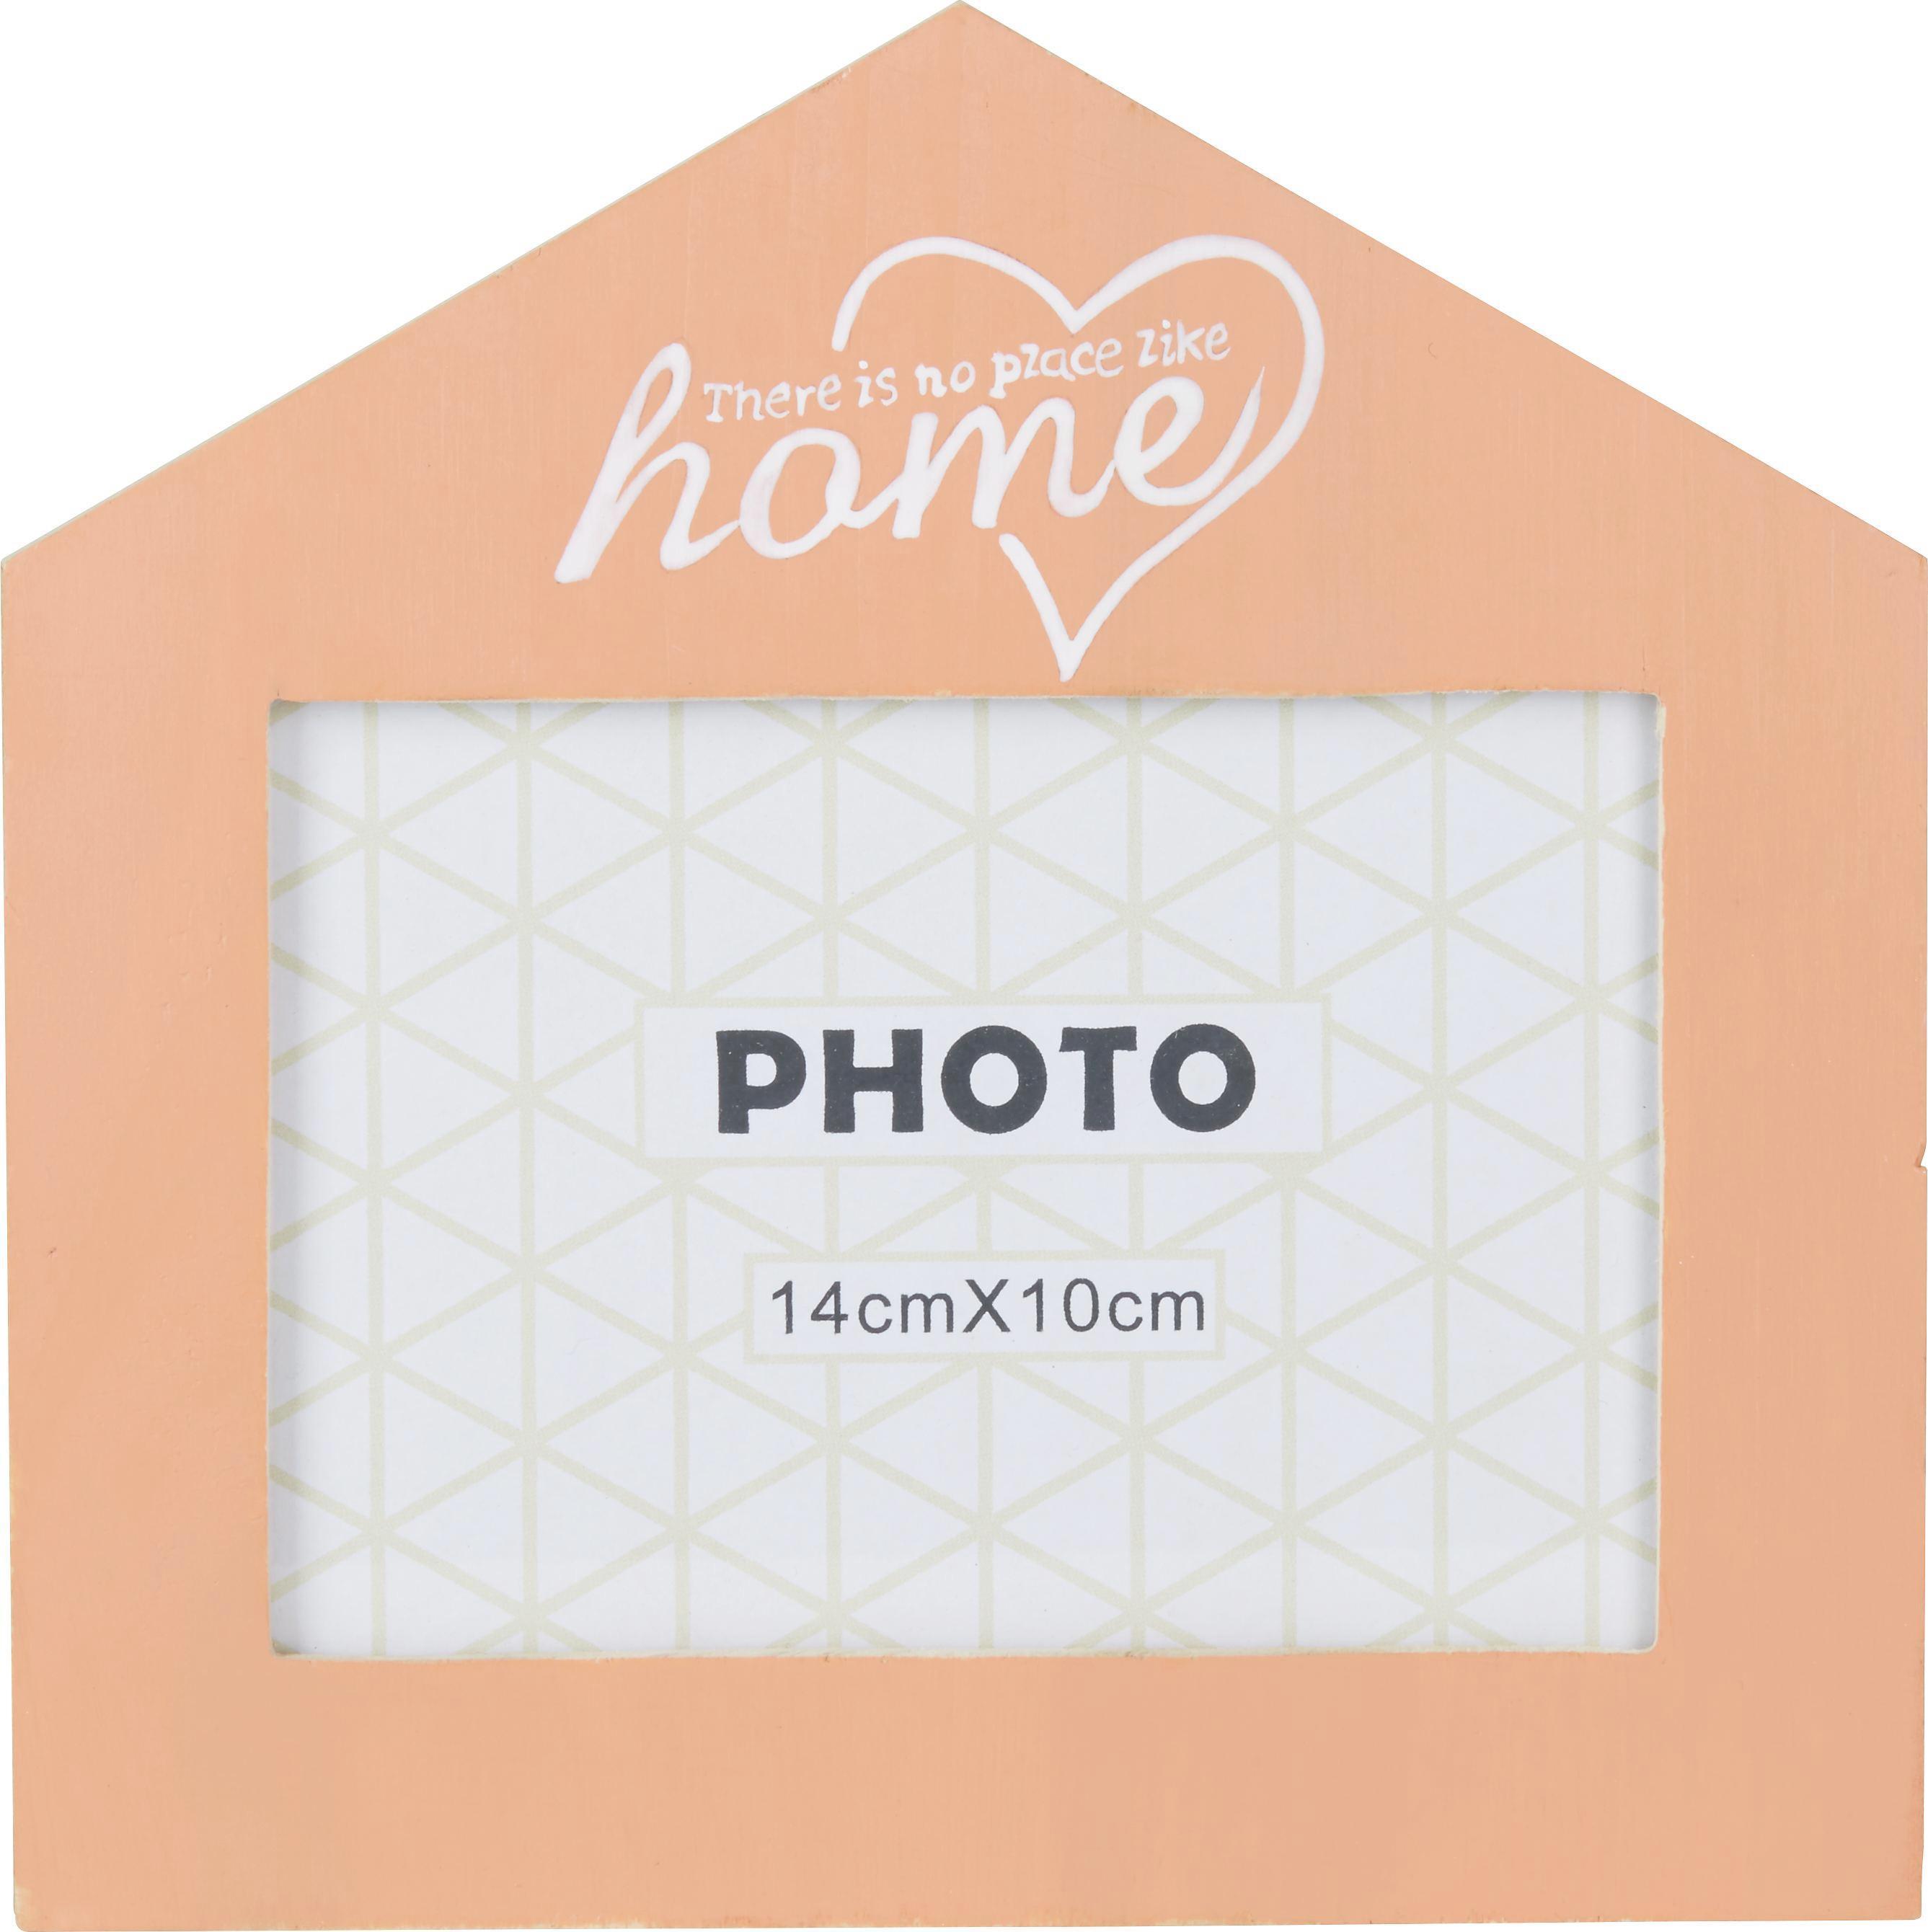 Bilderrahmen Home in Orange, ca. 14x10cm - Klar/Orange, Glas/Holz (18/18cm) - MÖMAX modern living